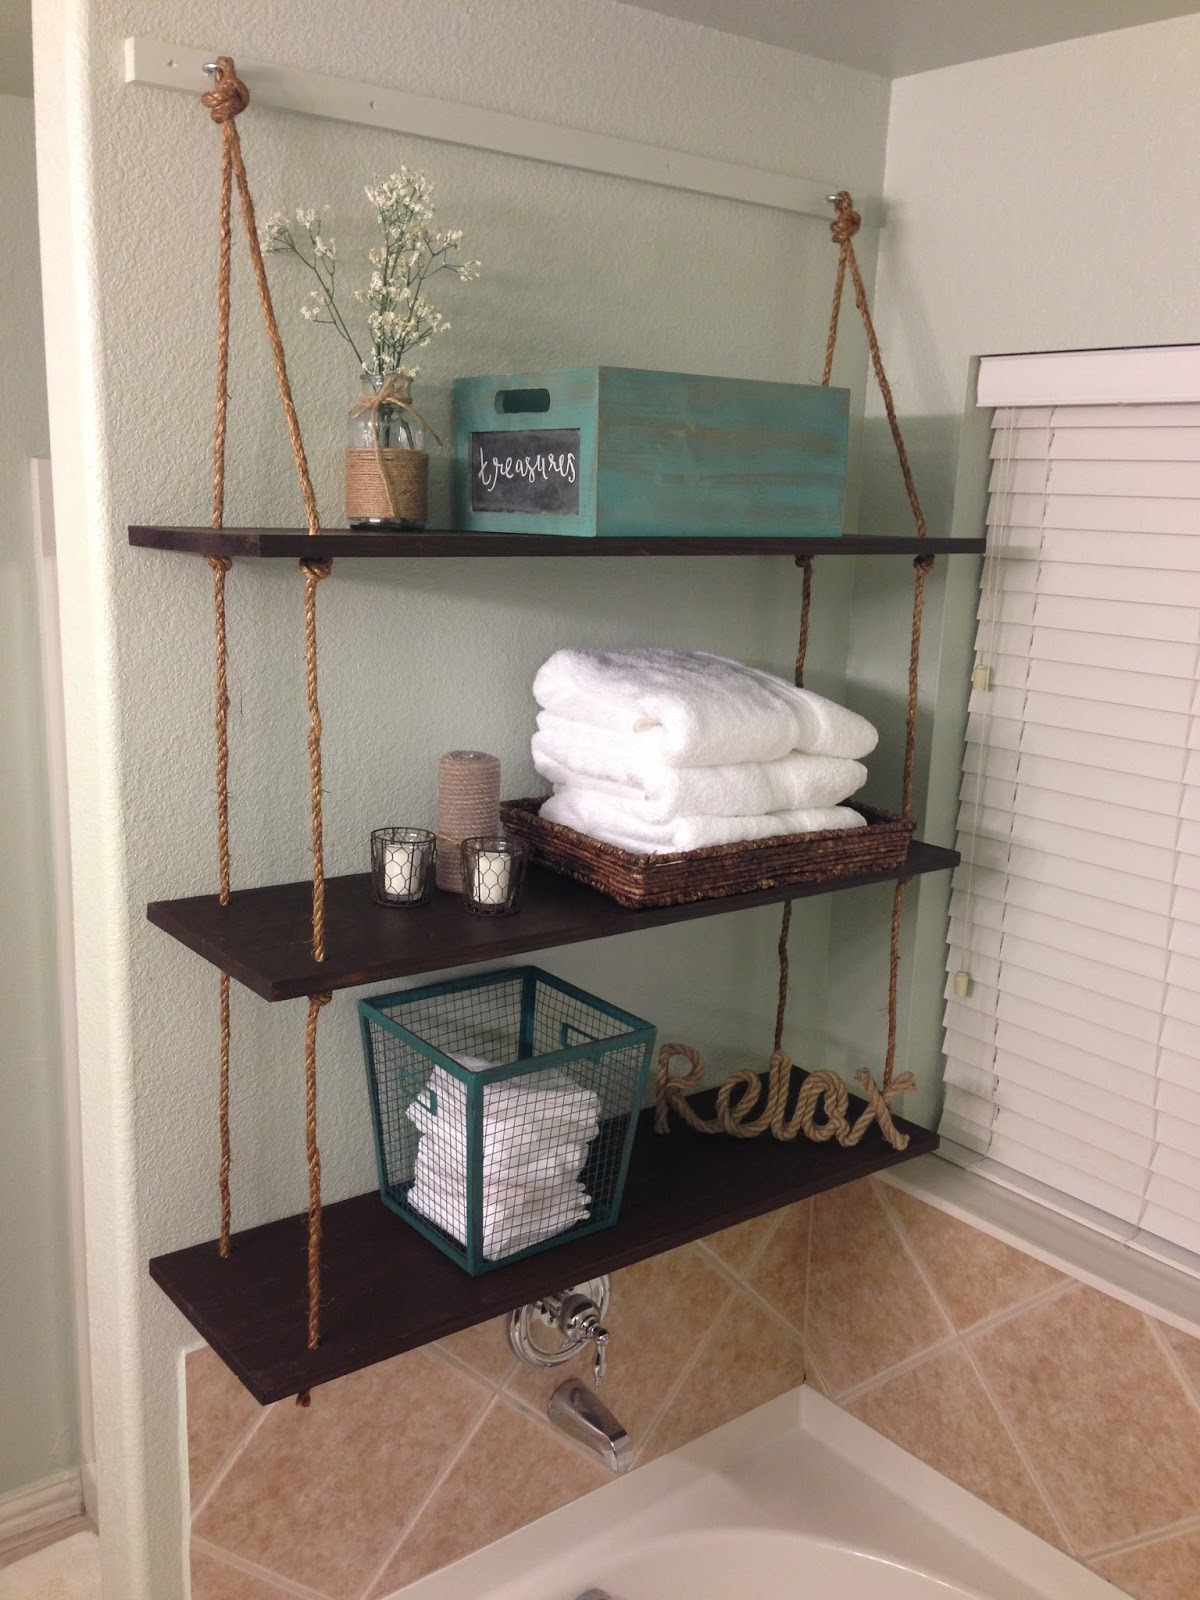 Mon Ami Createry Diy Rope Shelves